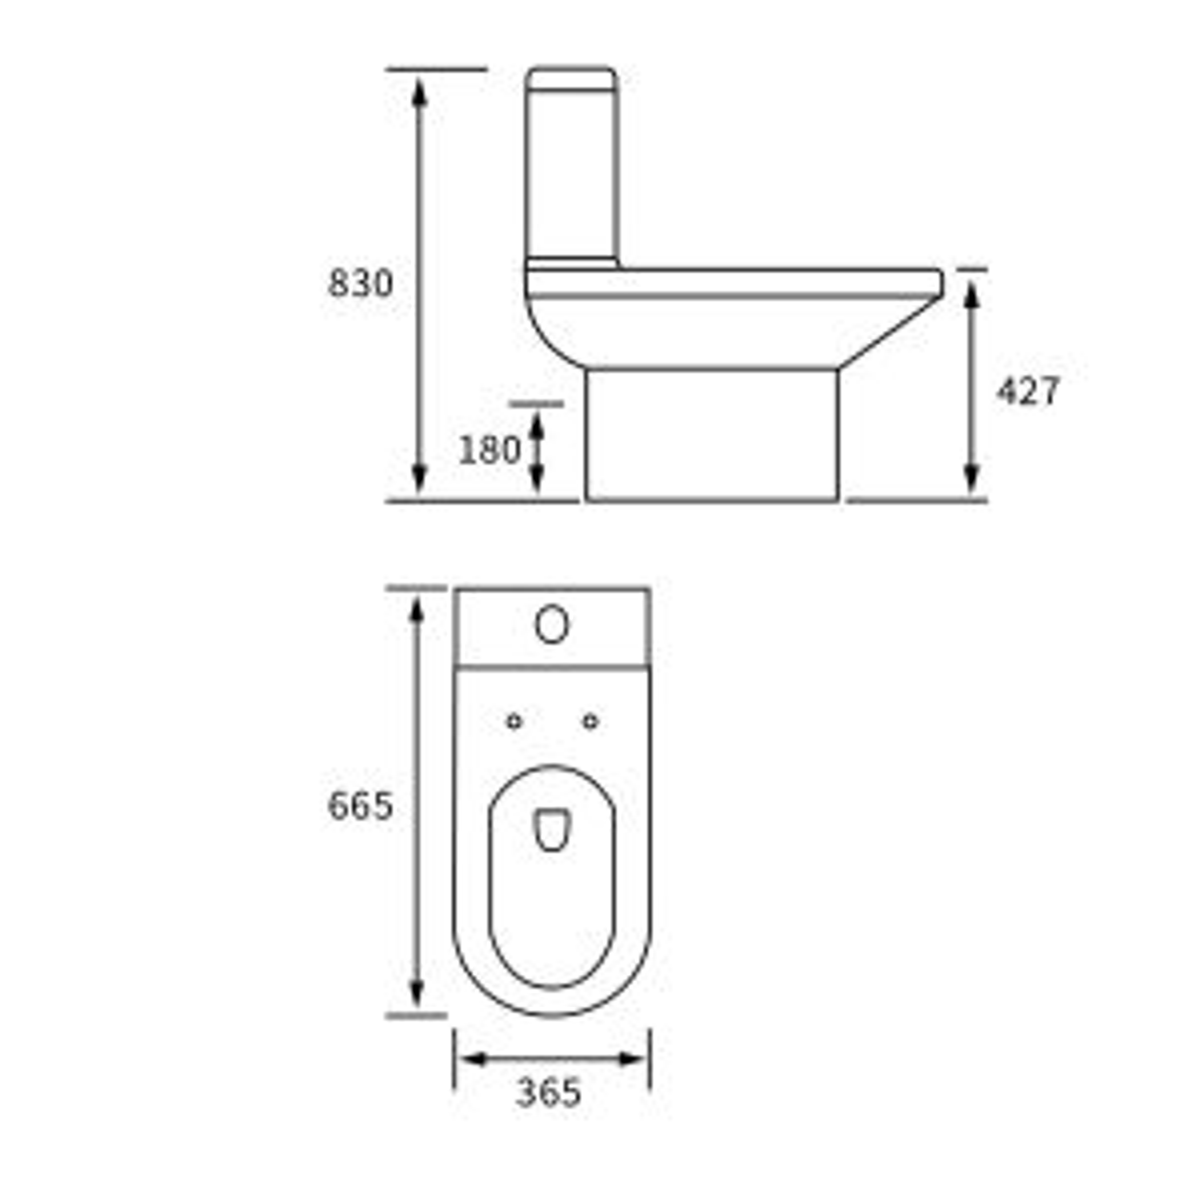 BTL White Laurus² Close Coupled Toilet Line Drawing